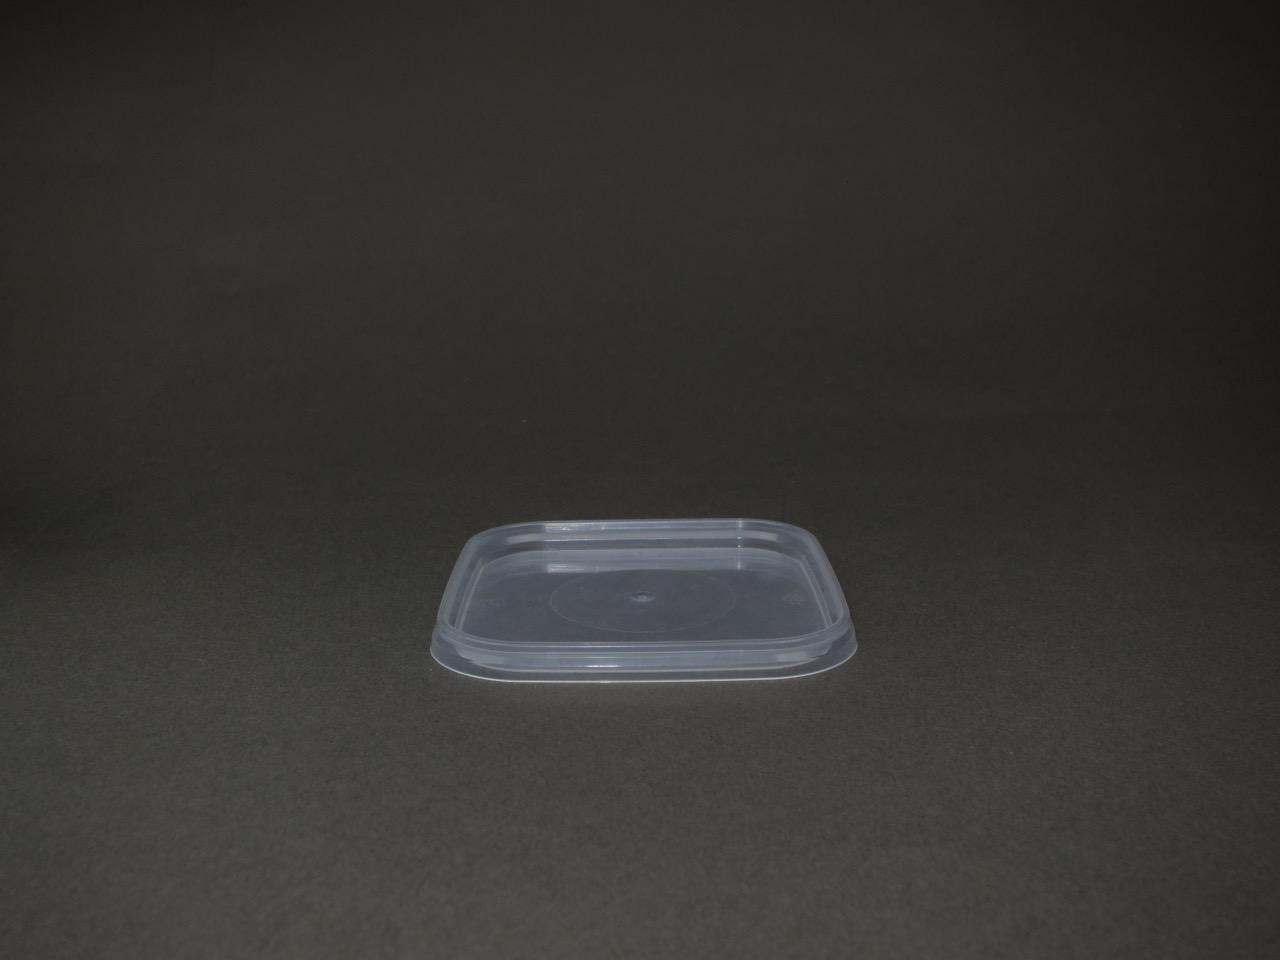 Lid Square 95mm x 95mm TOPPAC